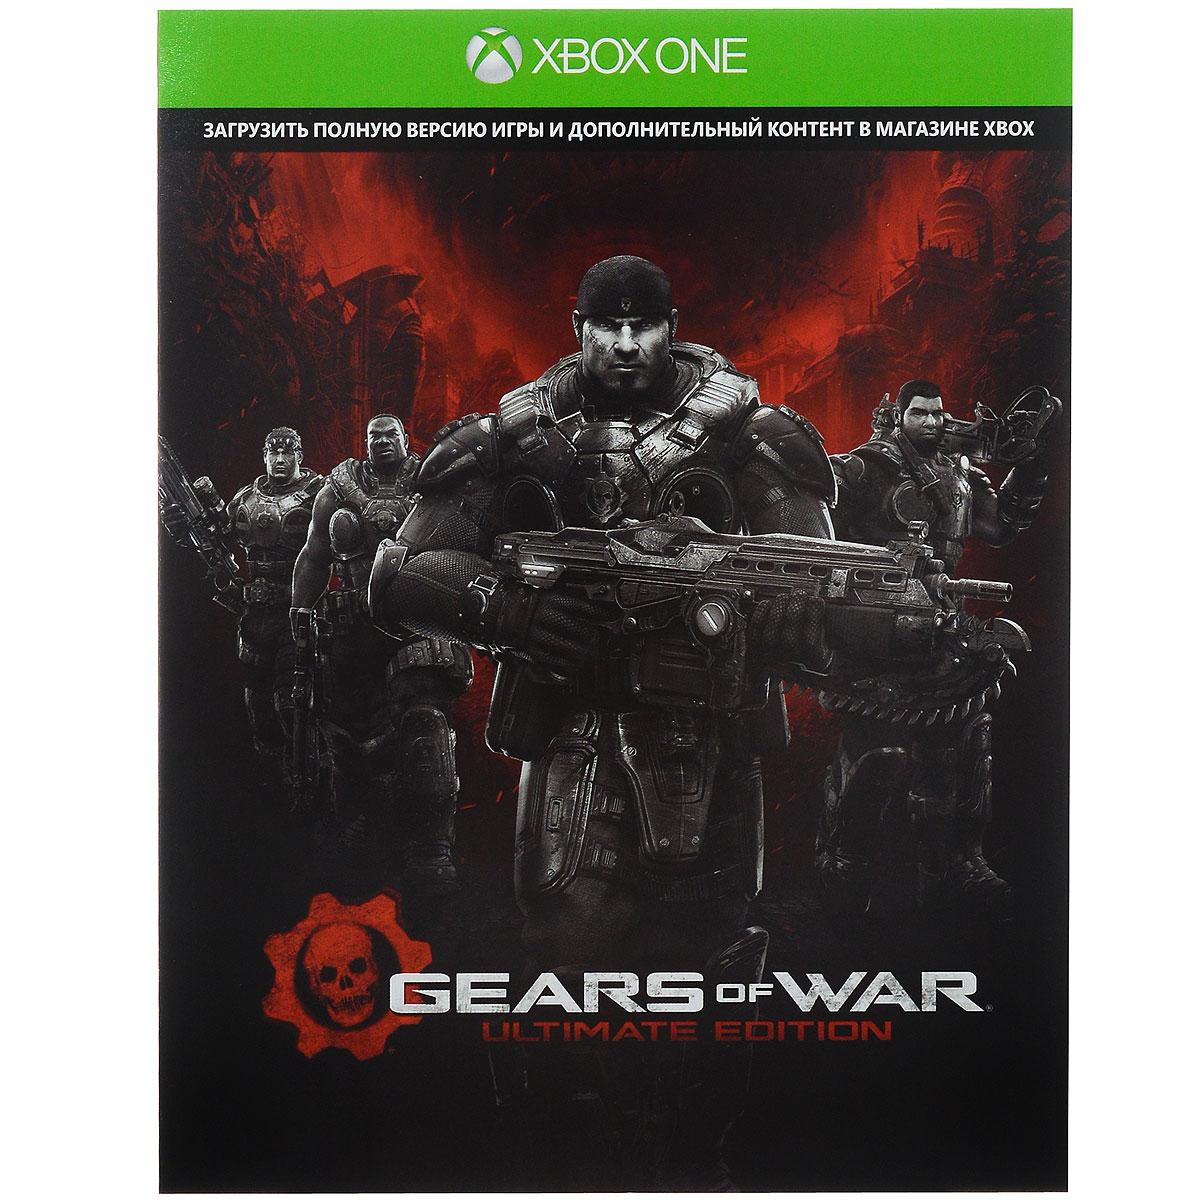 Игровая приставка Xbox One 500 ГБ + Gears of War: Ultimate Edition